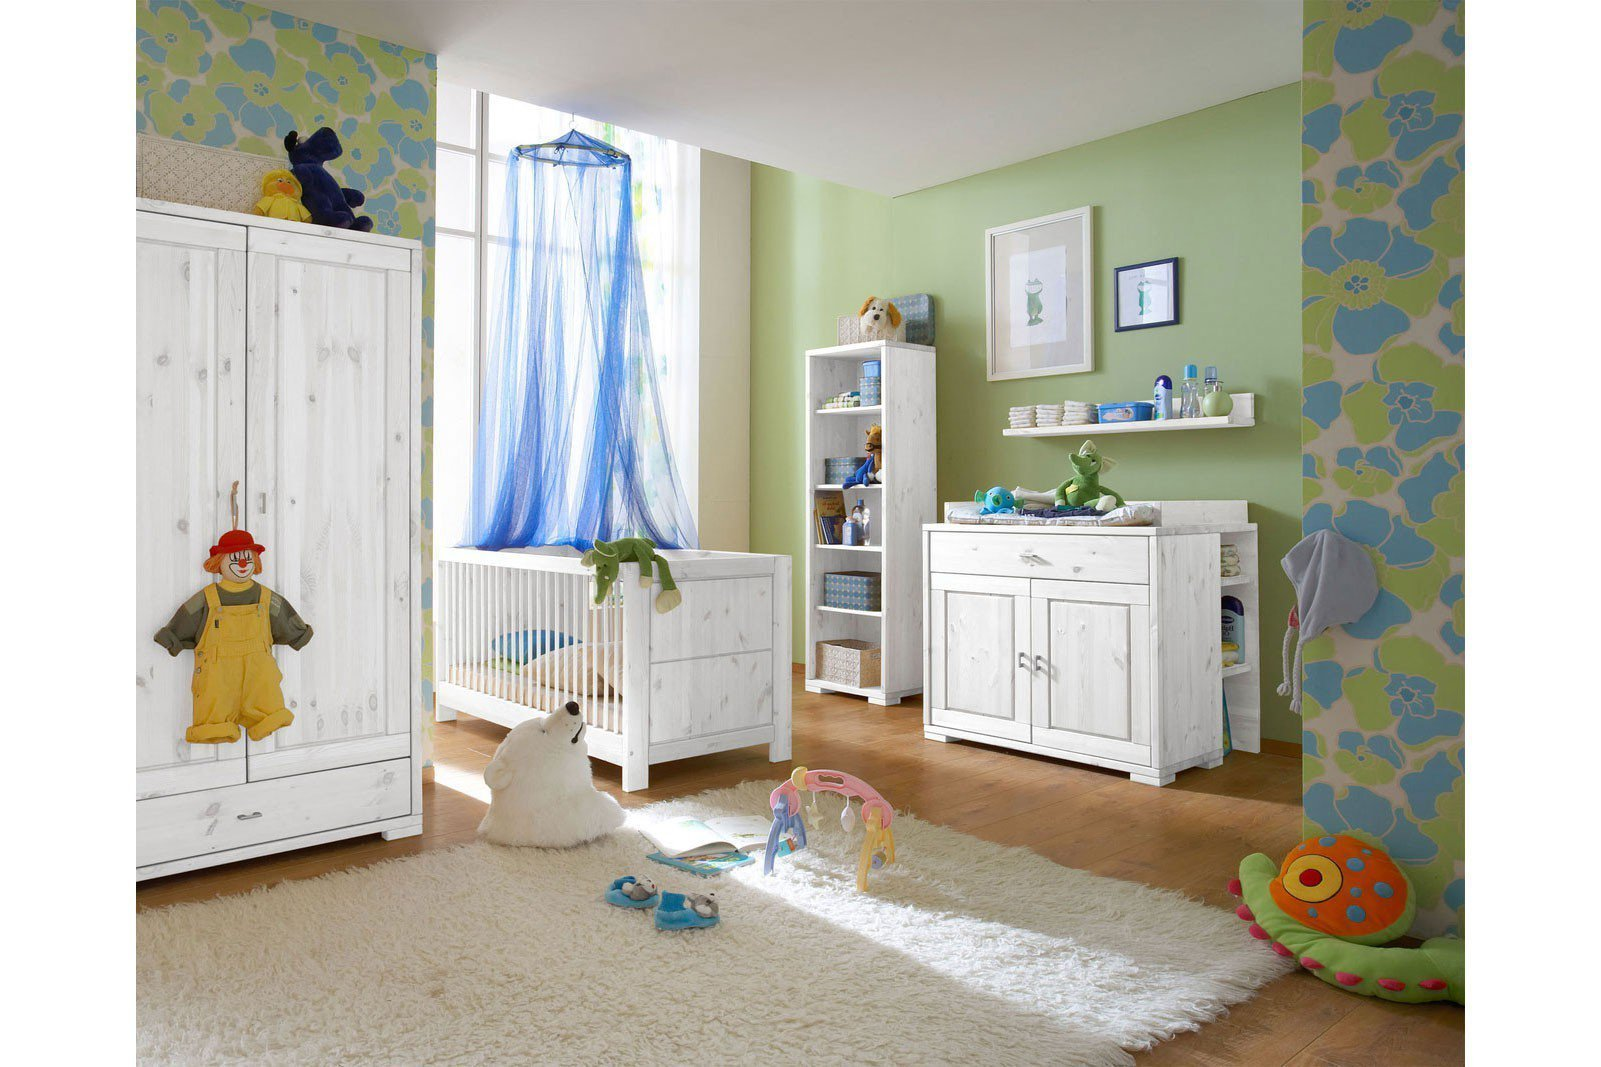 Luwo massivholz babyzimmer guldborg kiefer wei m bel - Babyzimmer deko set ...